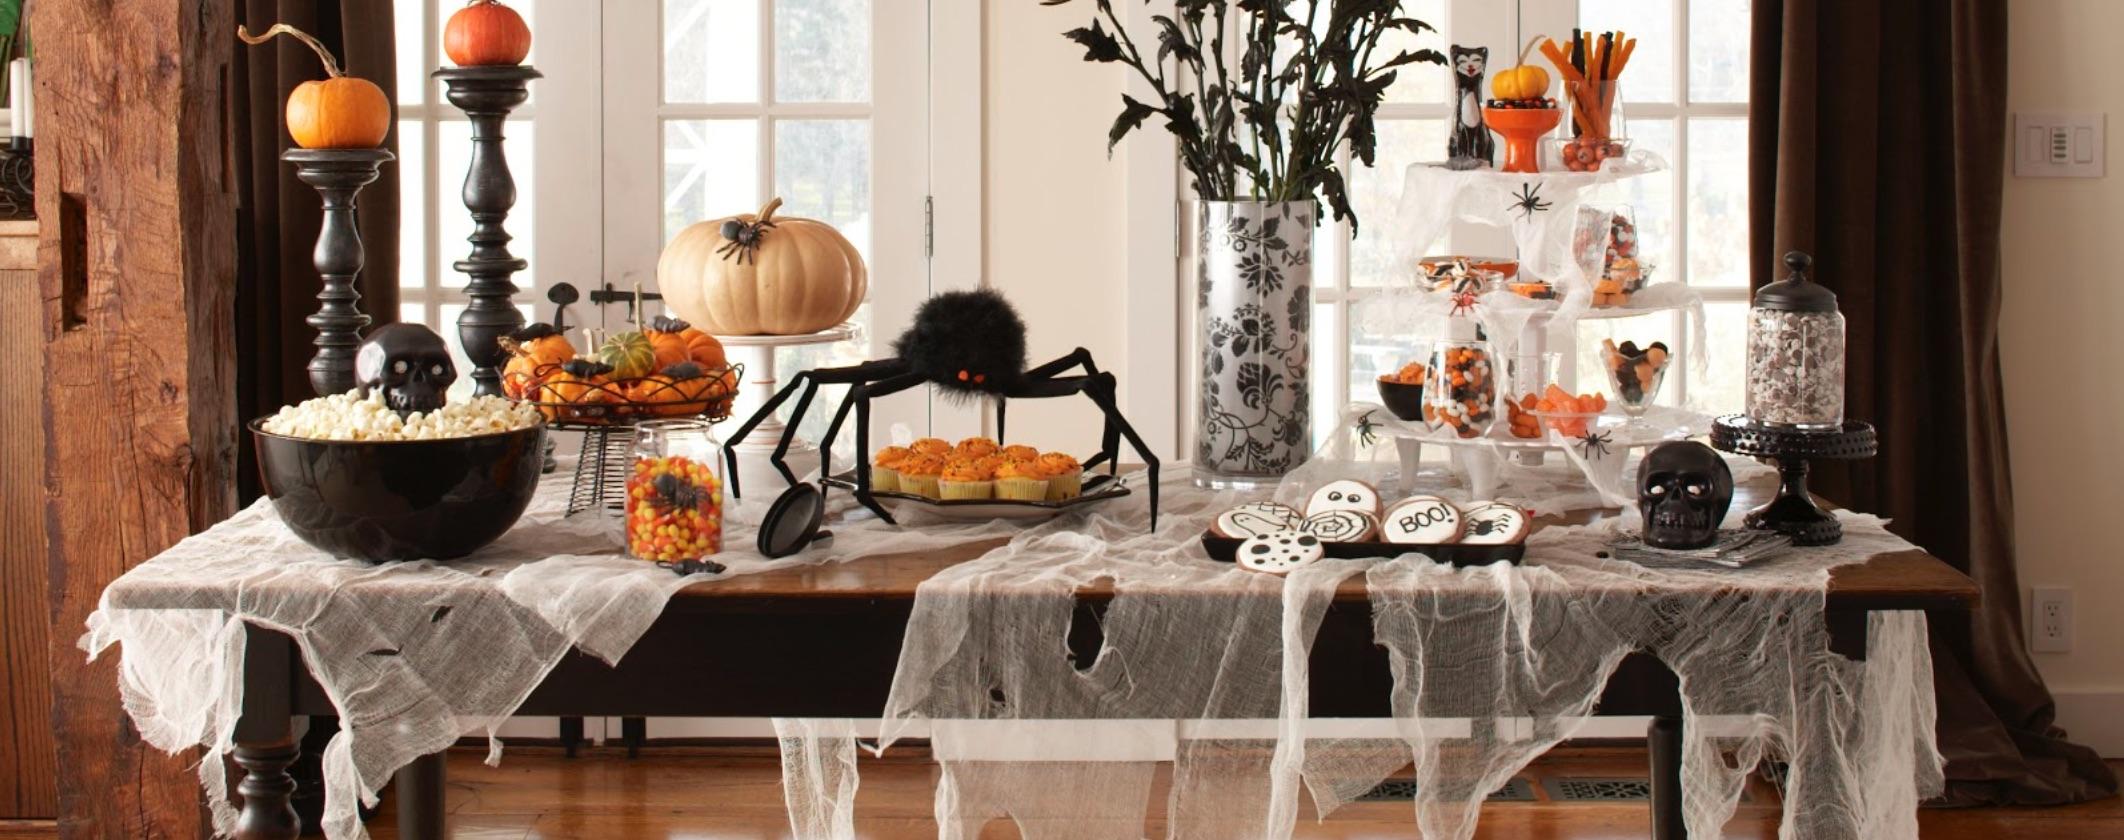 Diy halloween party decor zerorez huntsville for Zerorez hardwood floors